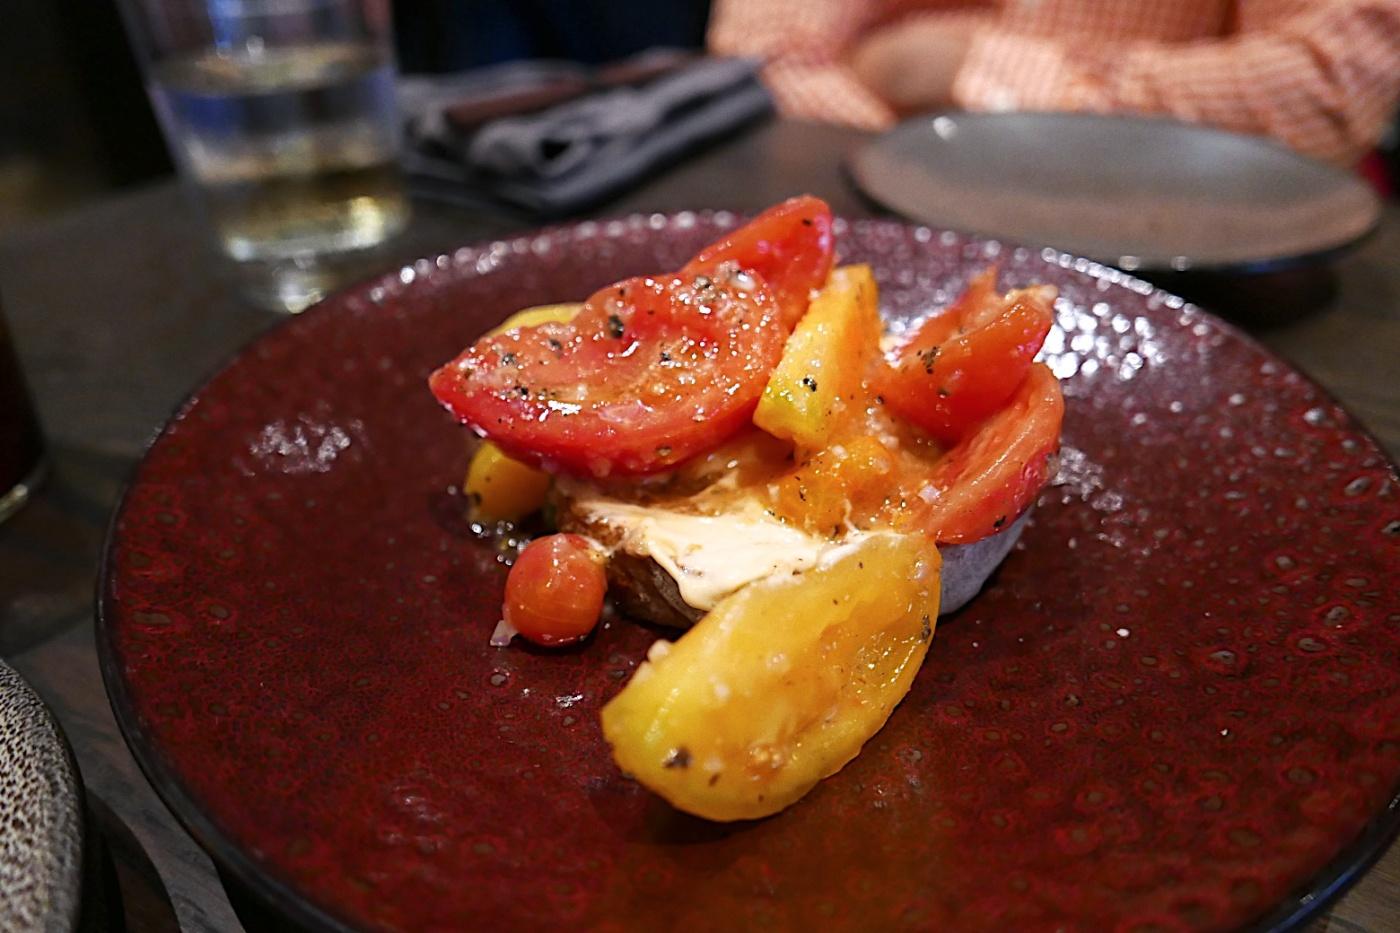 Tomato Bread, Mayo, Shallot, Pecan Oil